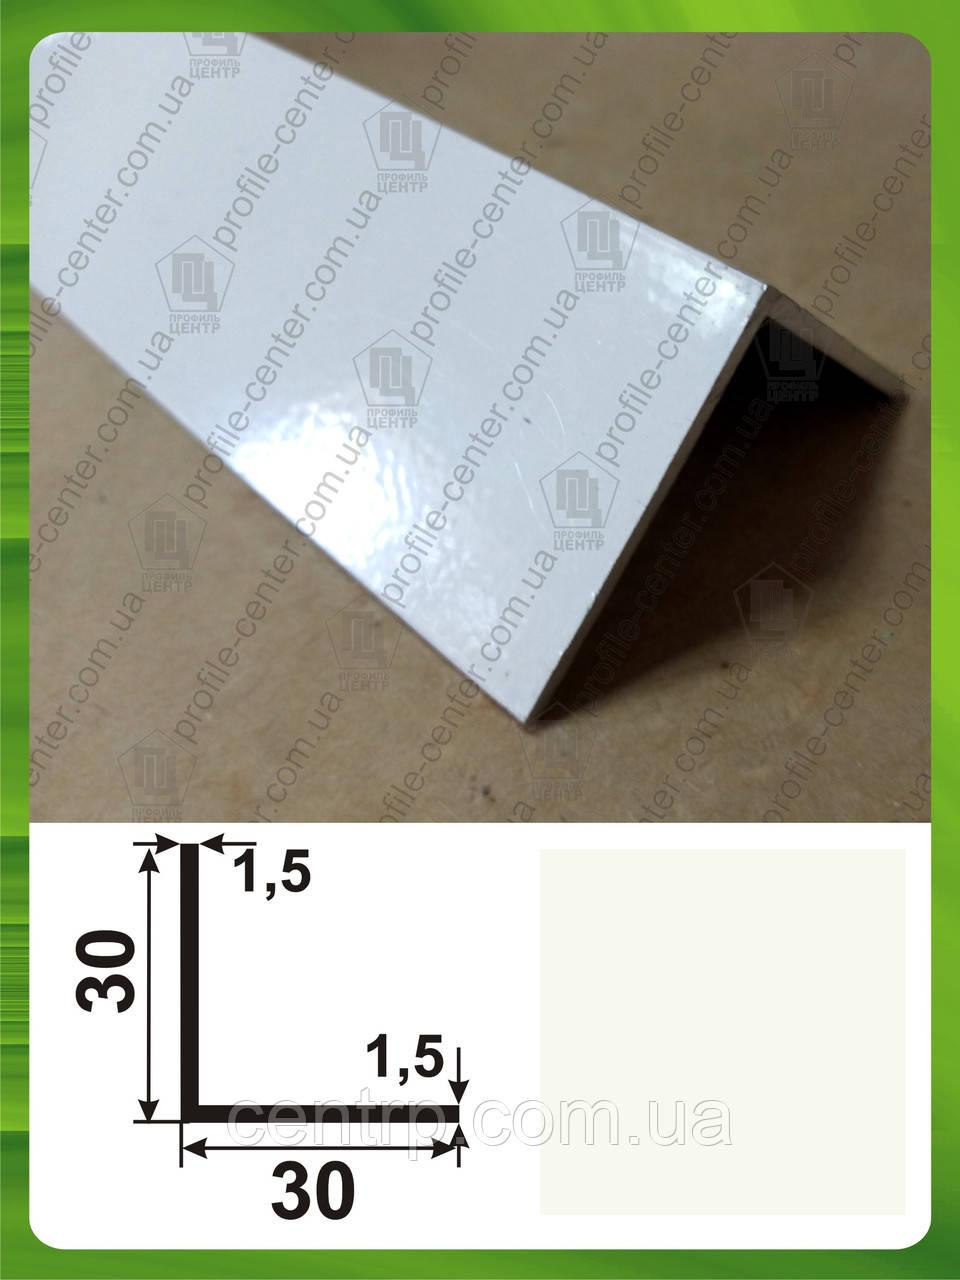 Угол алюминиевый 30х30х1,5 равнополочный равносторонний Белоснежный (краш)